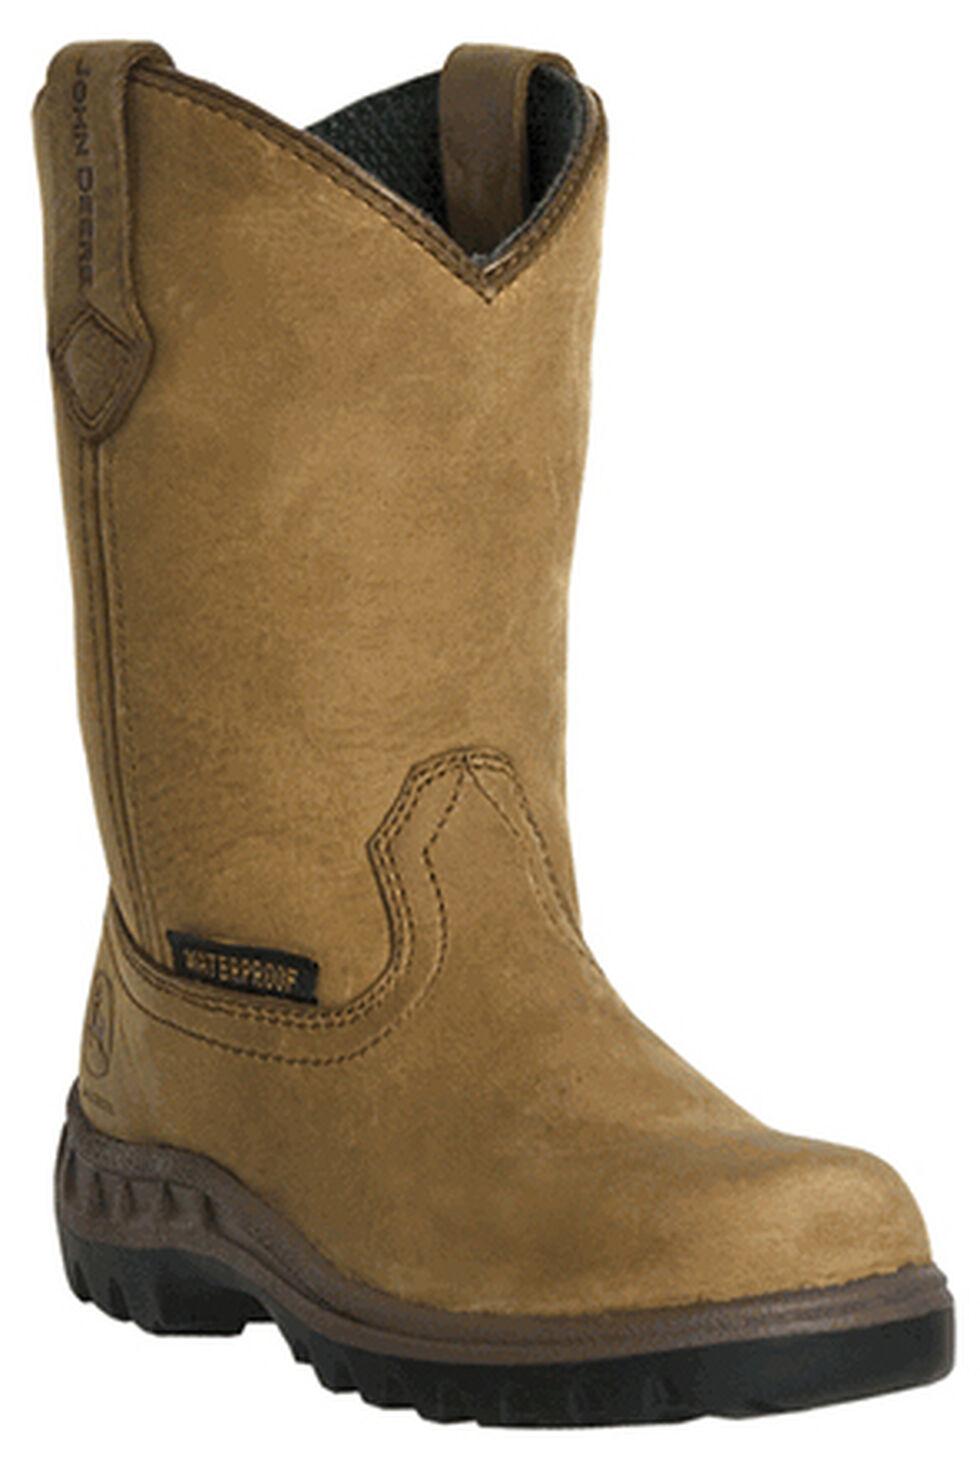 John Deere Youth Boys' Johnny Popper Waterproof Western Boots - Round Toe, Coffee, hi-res